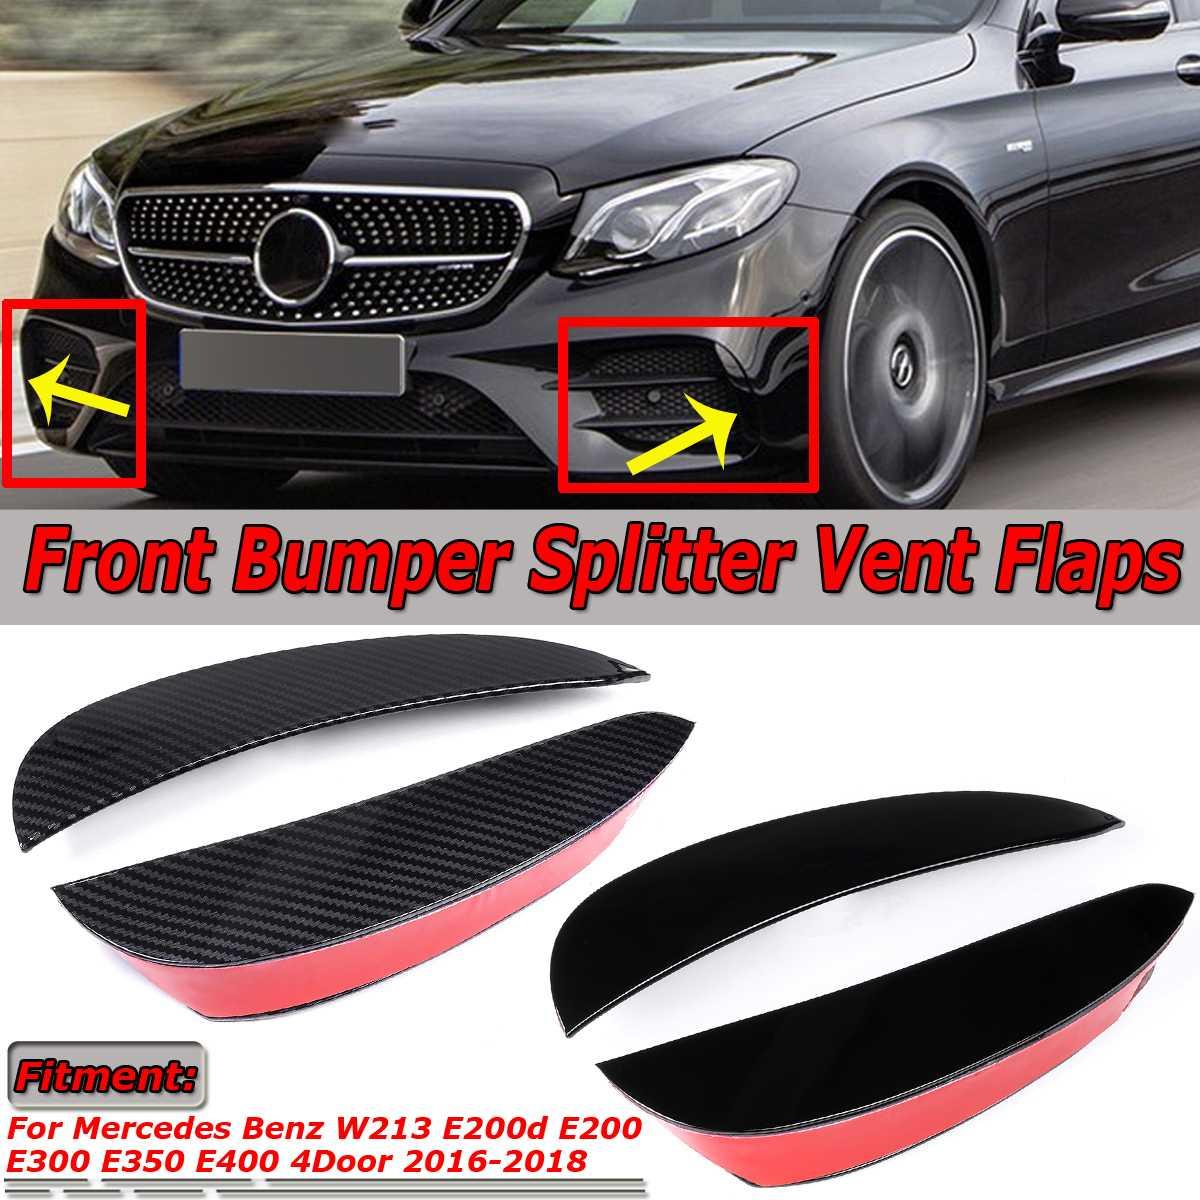 2x Auto Voorbumper Lip Splitter Vent Flappen Spolier Fin Voor Mercedes Benz E Klasse W213 E200 E300 E350 4Dr Voor Amg 2016-2018